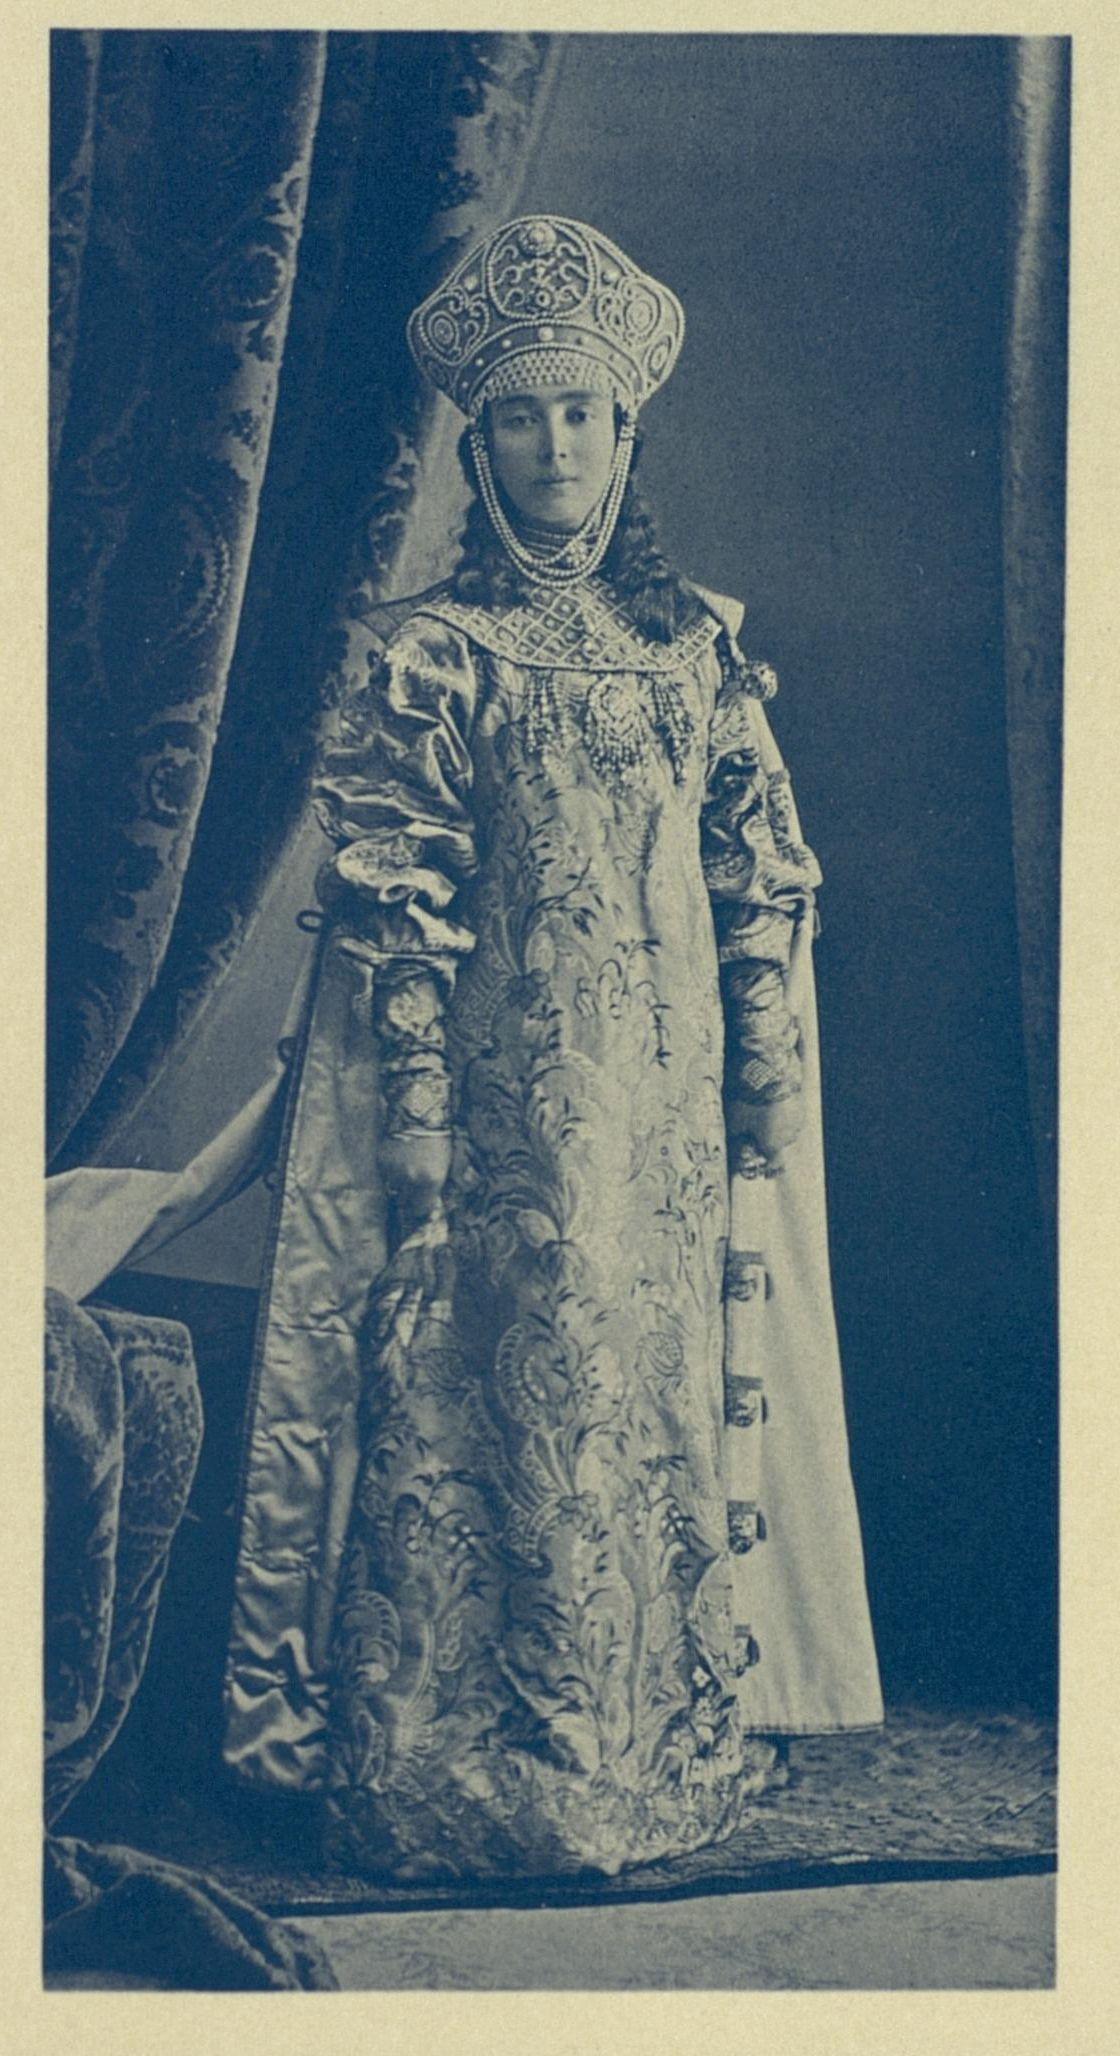 Princess Elizabeth (Elizaveta) Nikolaevna Obolenskaya, the Lesser, in 17th-century boyarishnya's attire